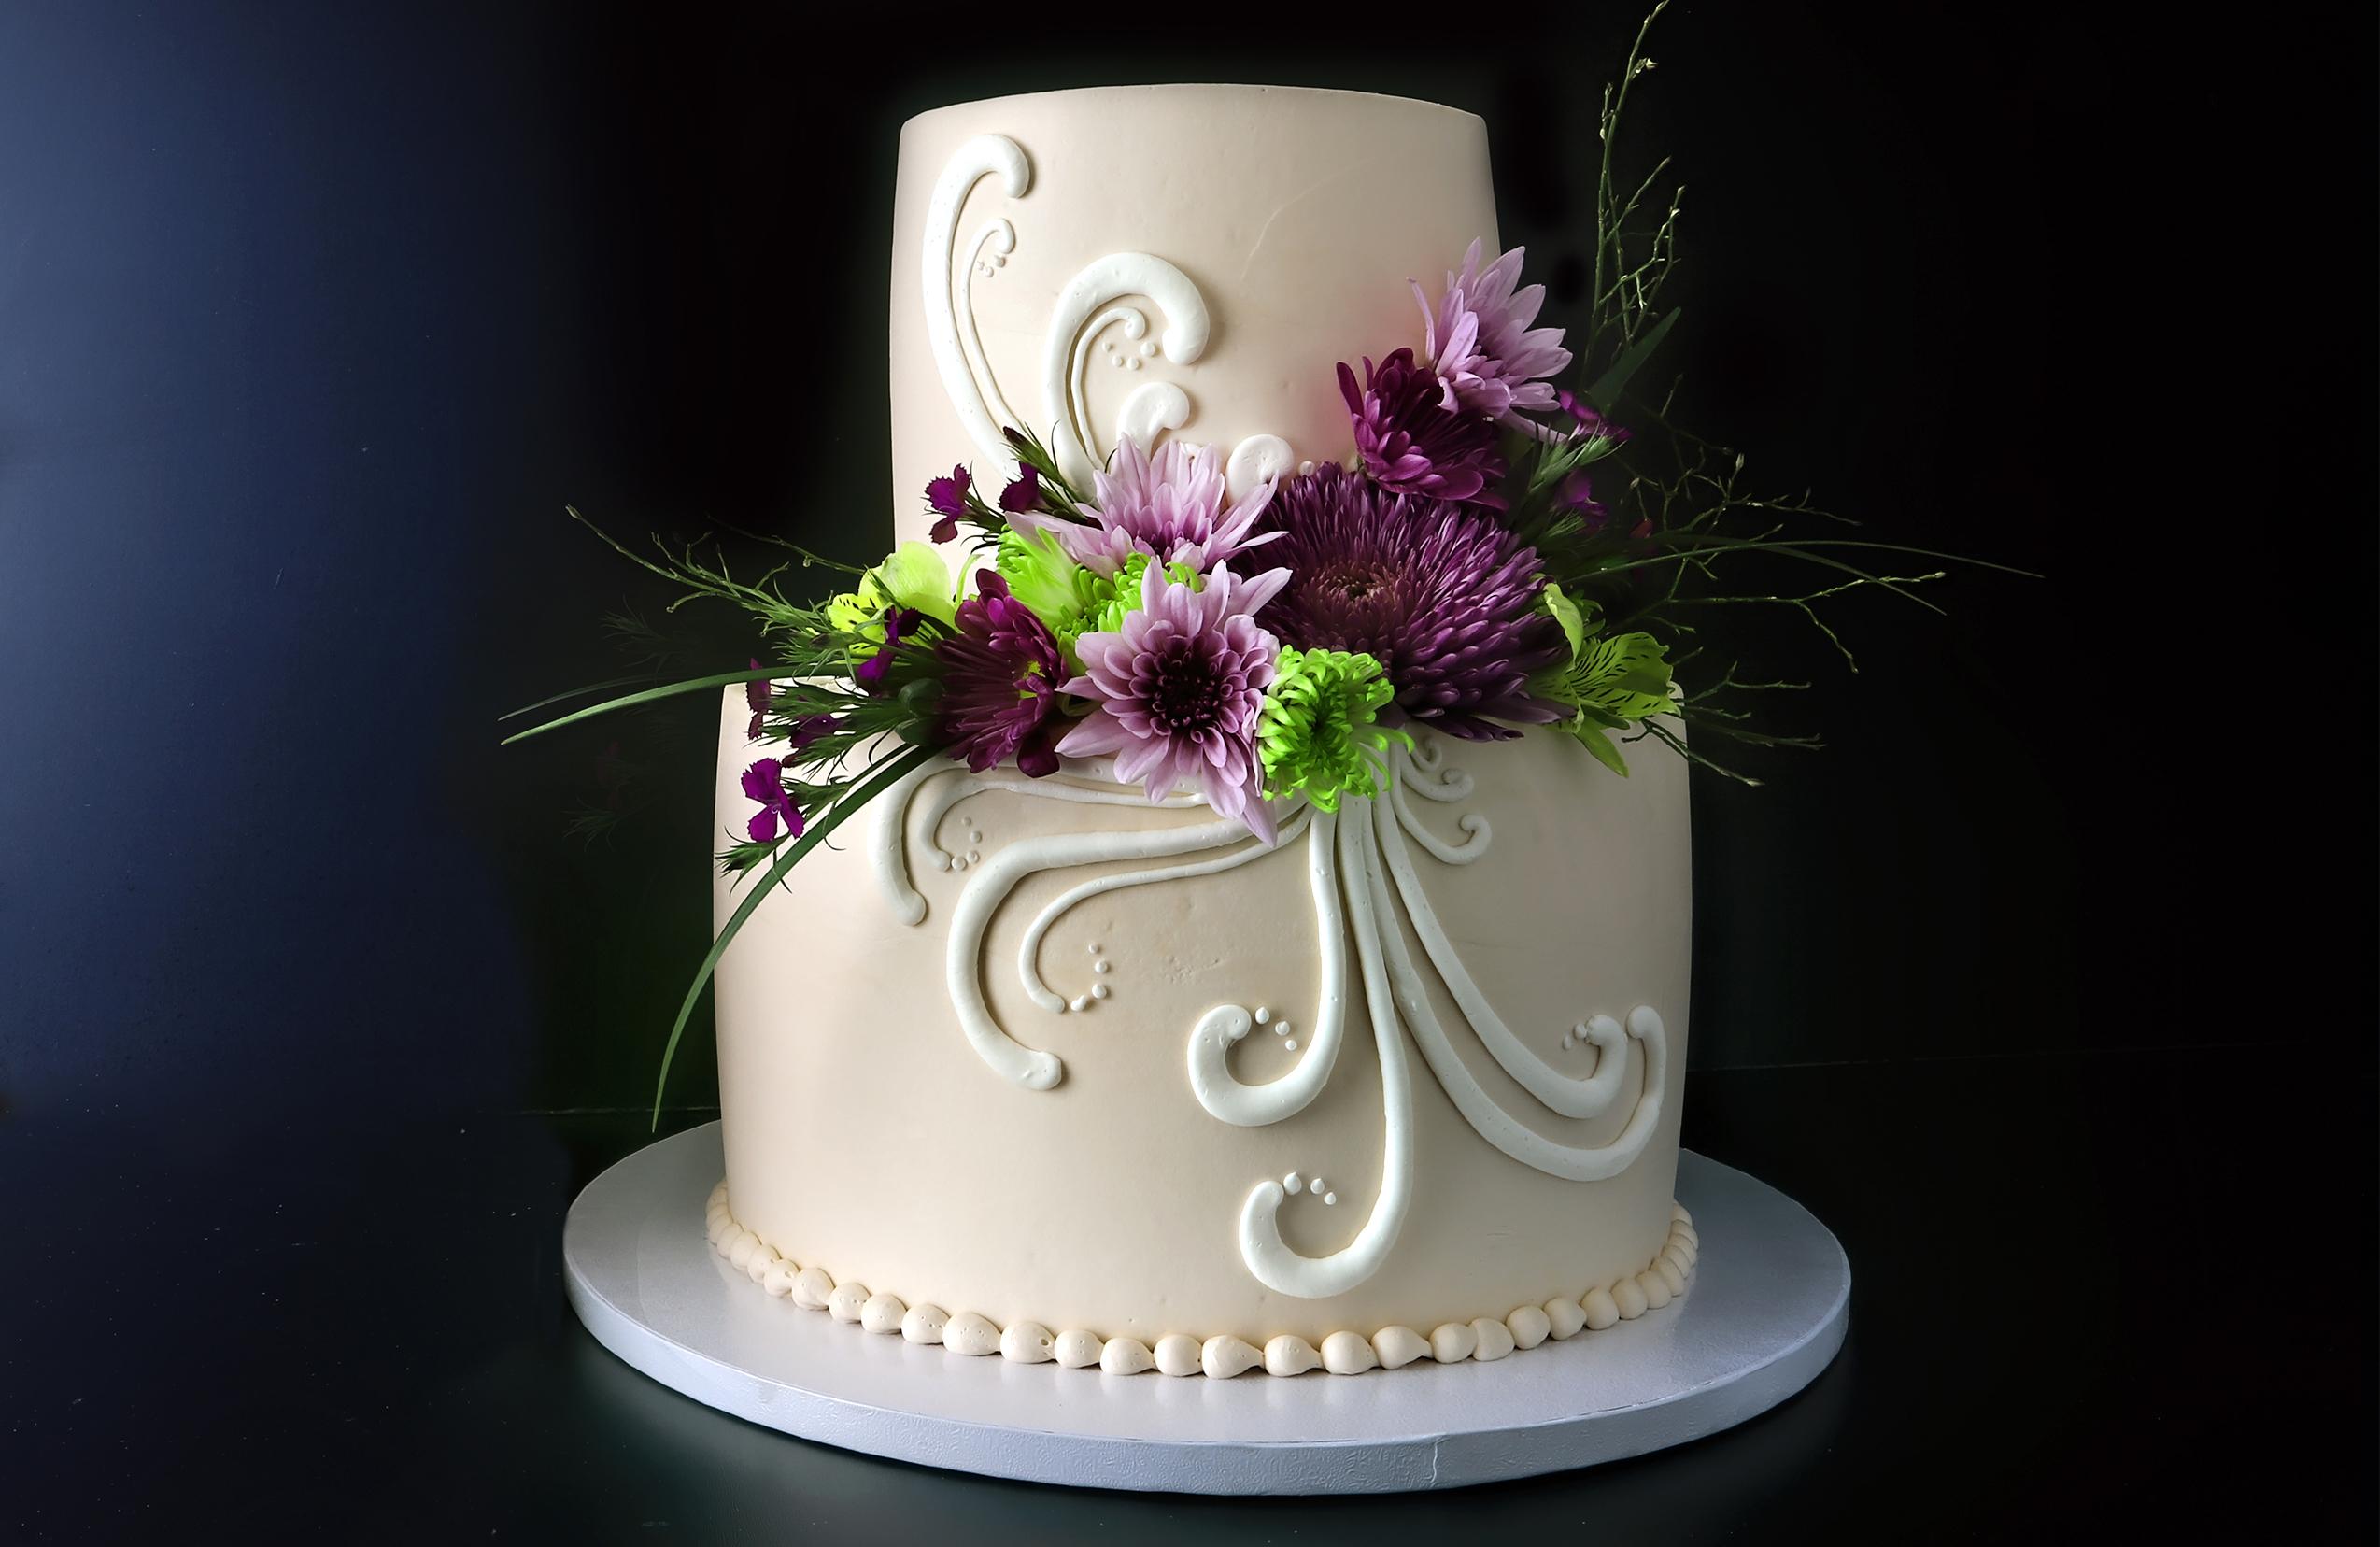 Bakery - Wedding Cakes